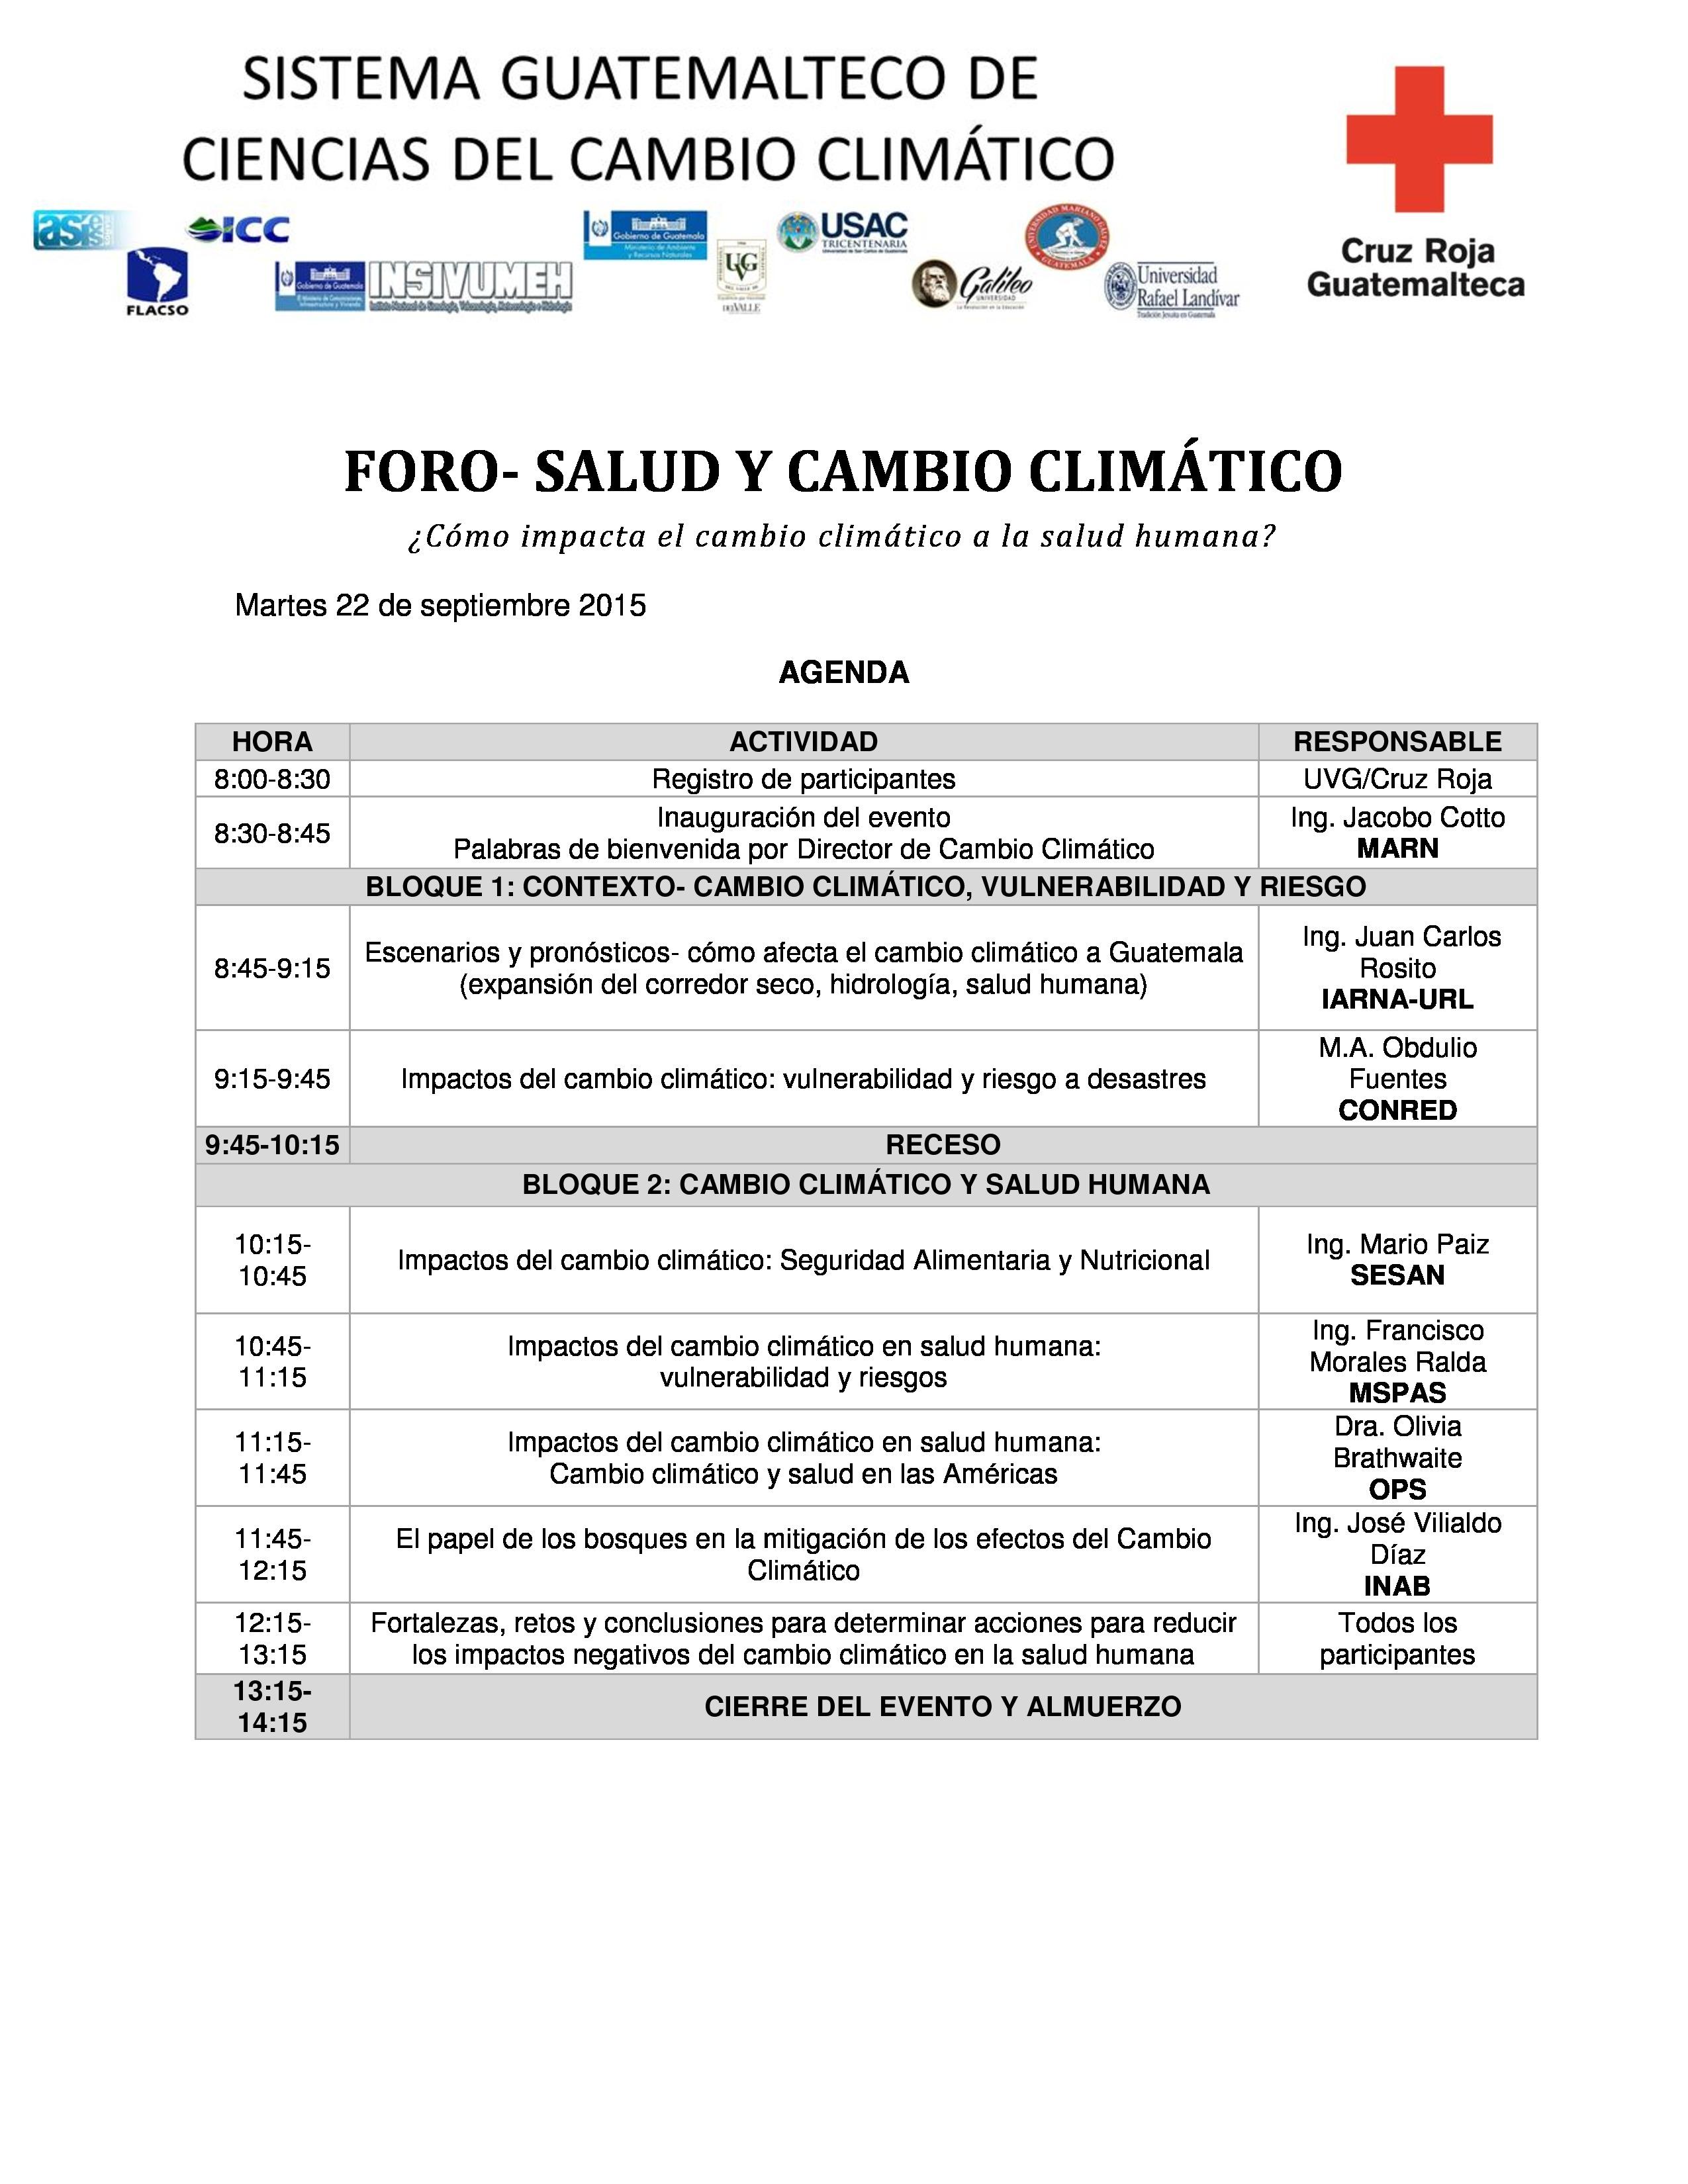 AgendaForoSaludyCambioClimatico 2015